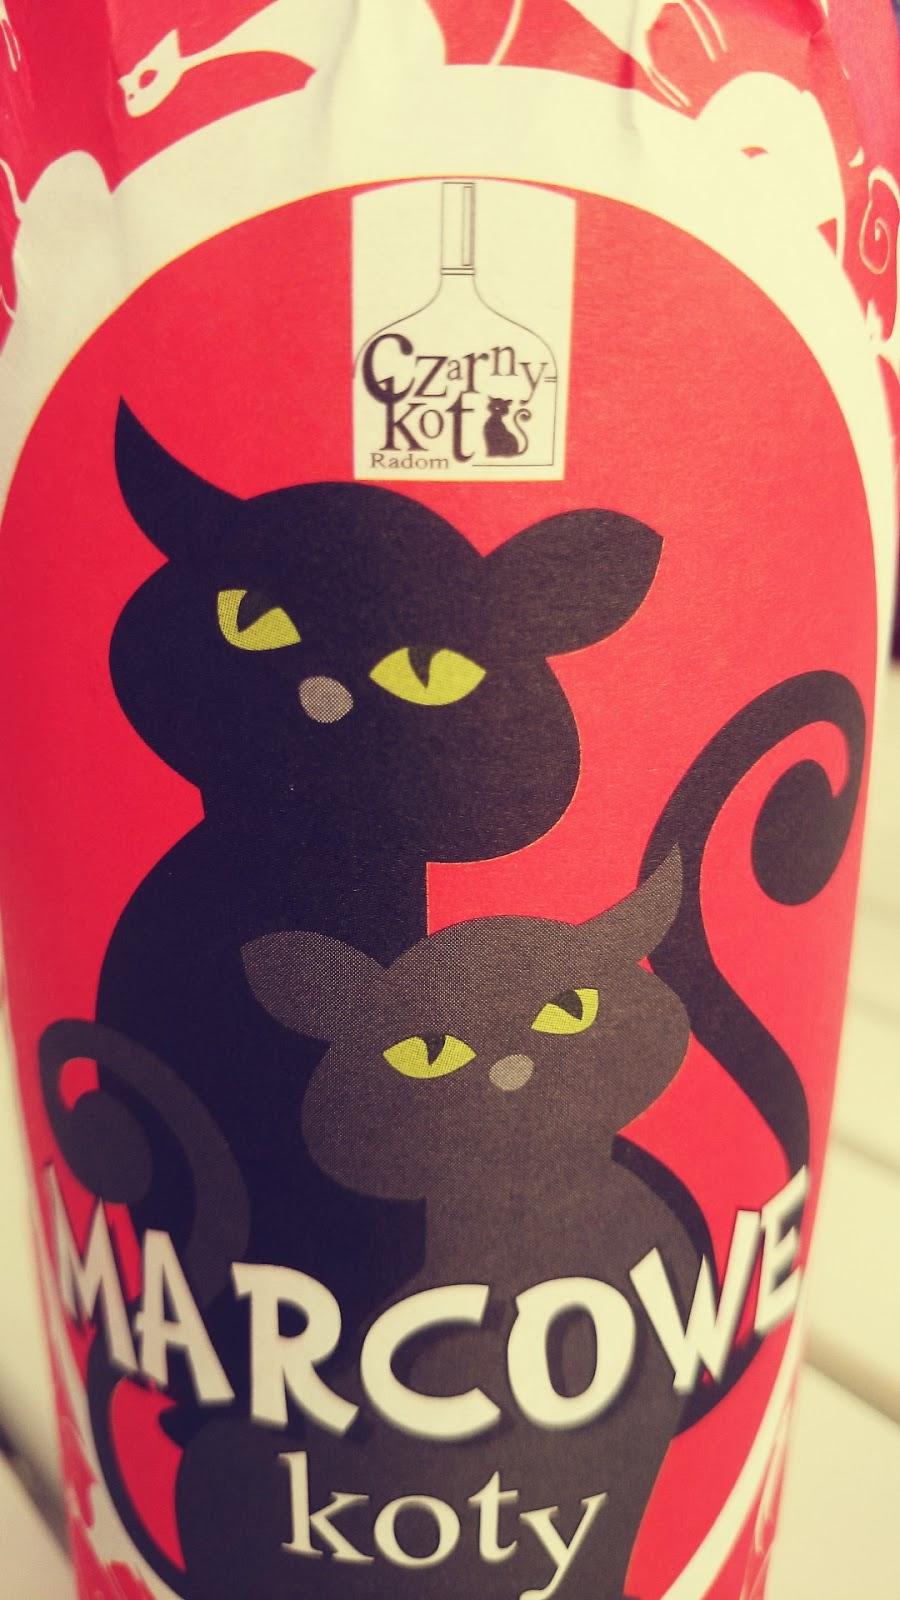 Marcowe koty piwo